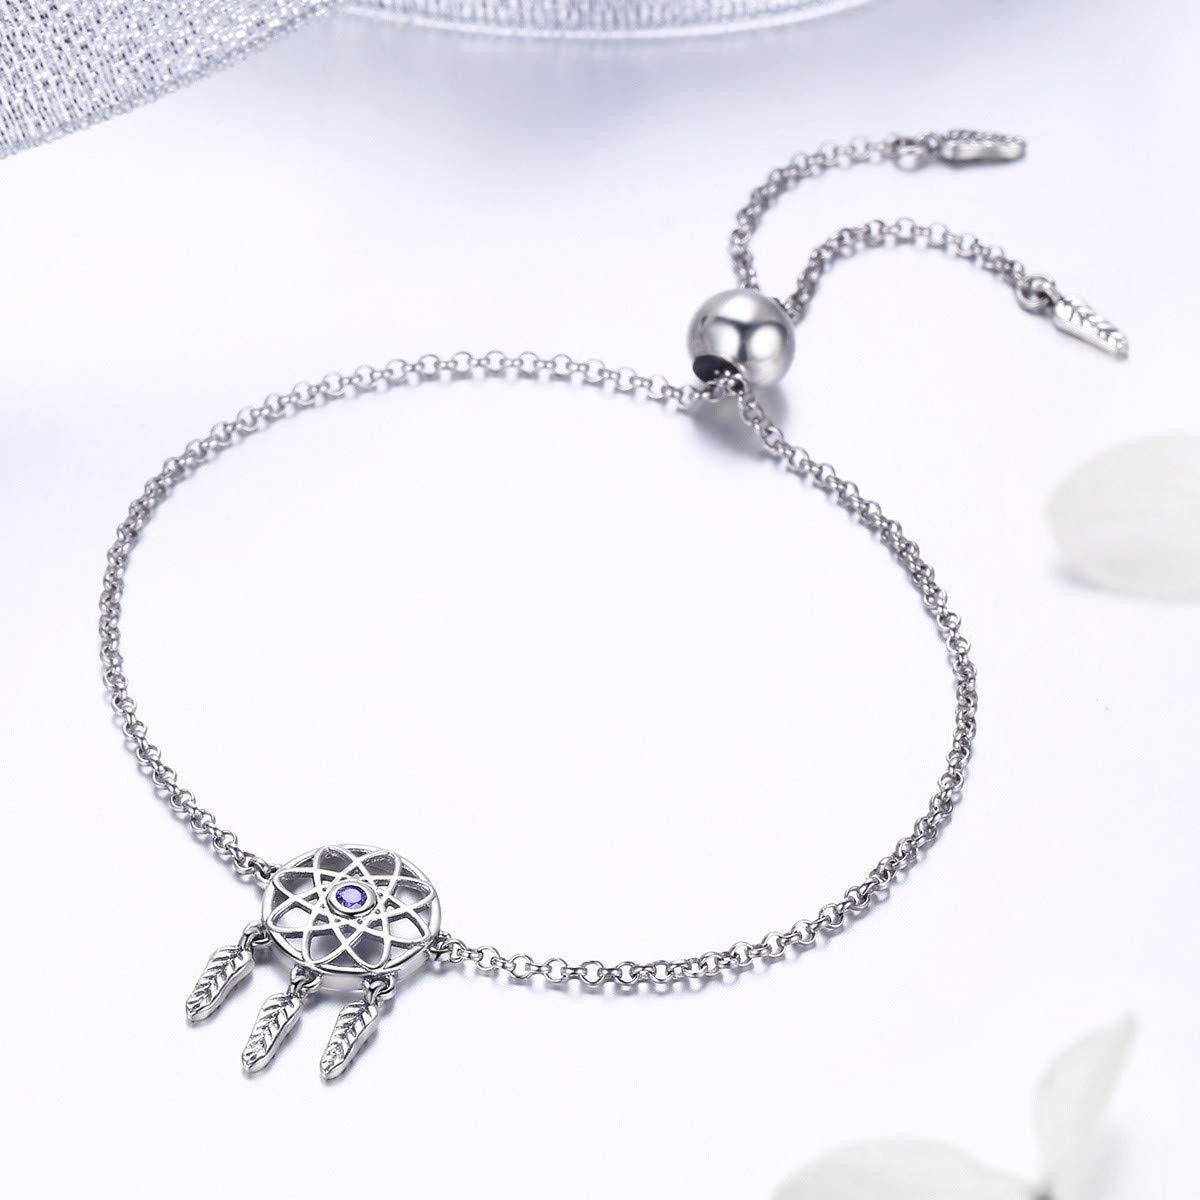 BAMOER 925 Sterling Silver Dream Net Link Chain Vintage Silver Bracelets for Women Fashion Adjustable Silver Women Bracelets Jewelry Gift Souvenir